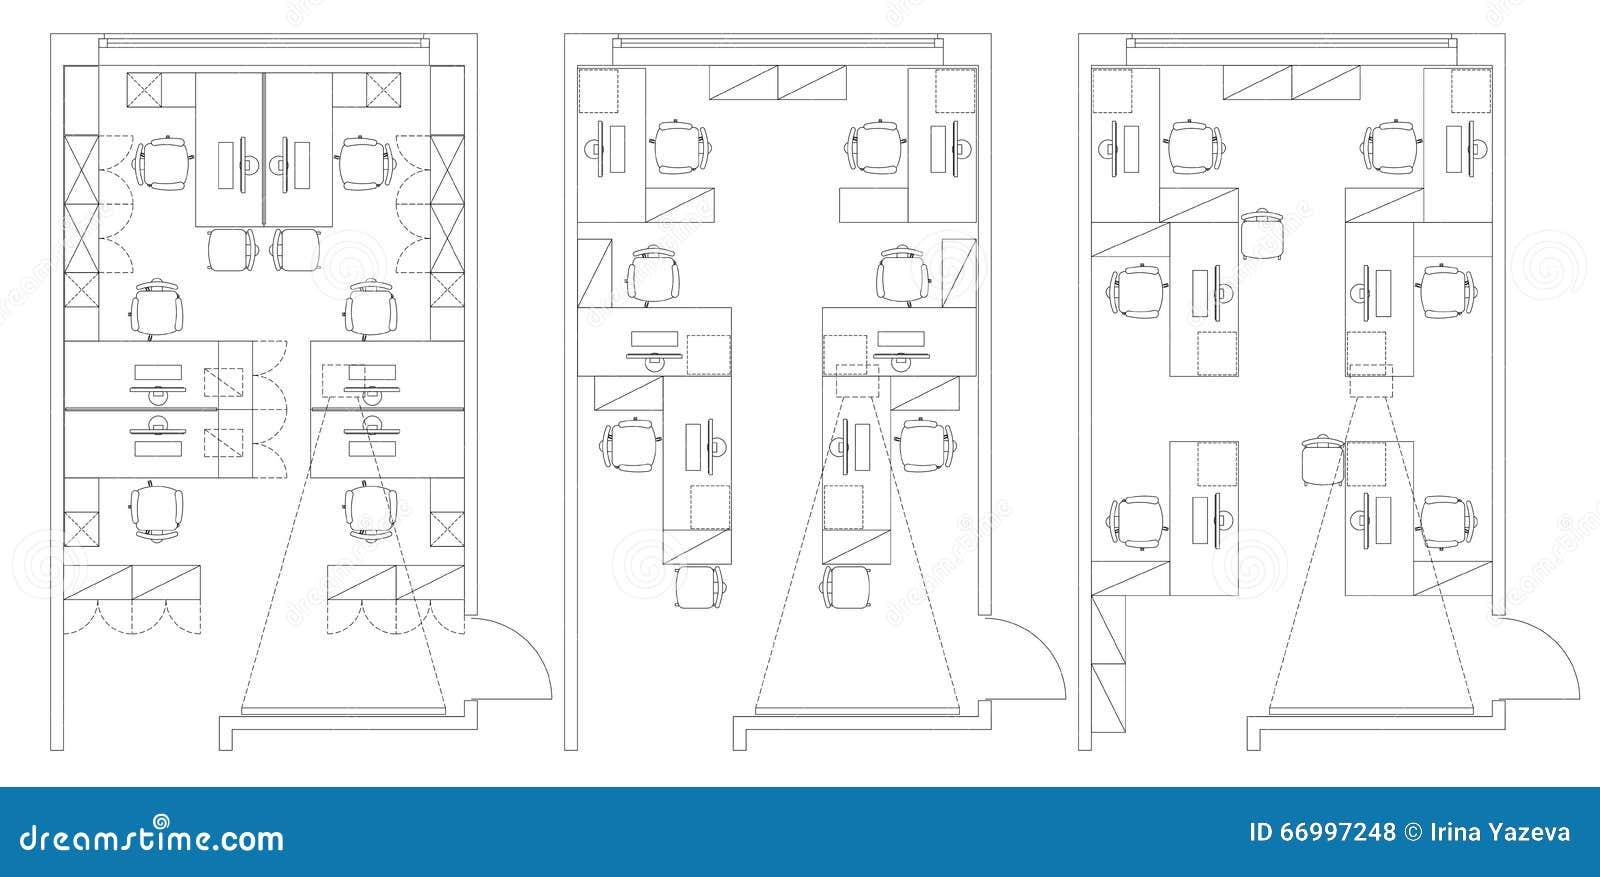 Standard office furniture symbols set vector illustration for Meuble architectural